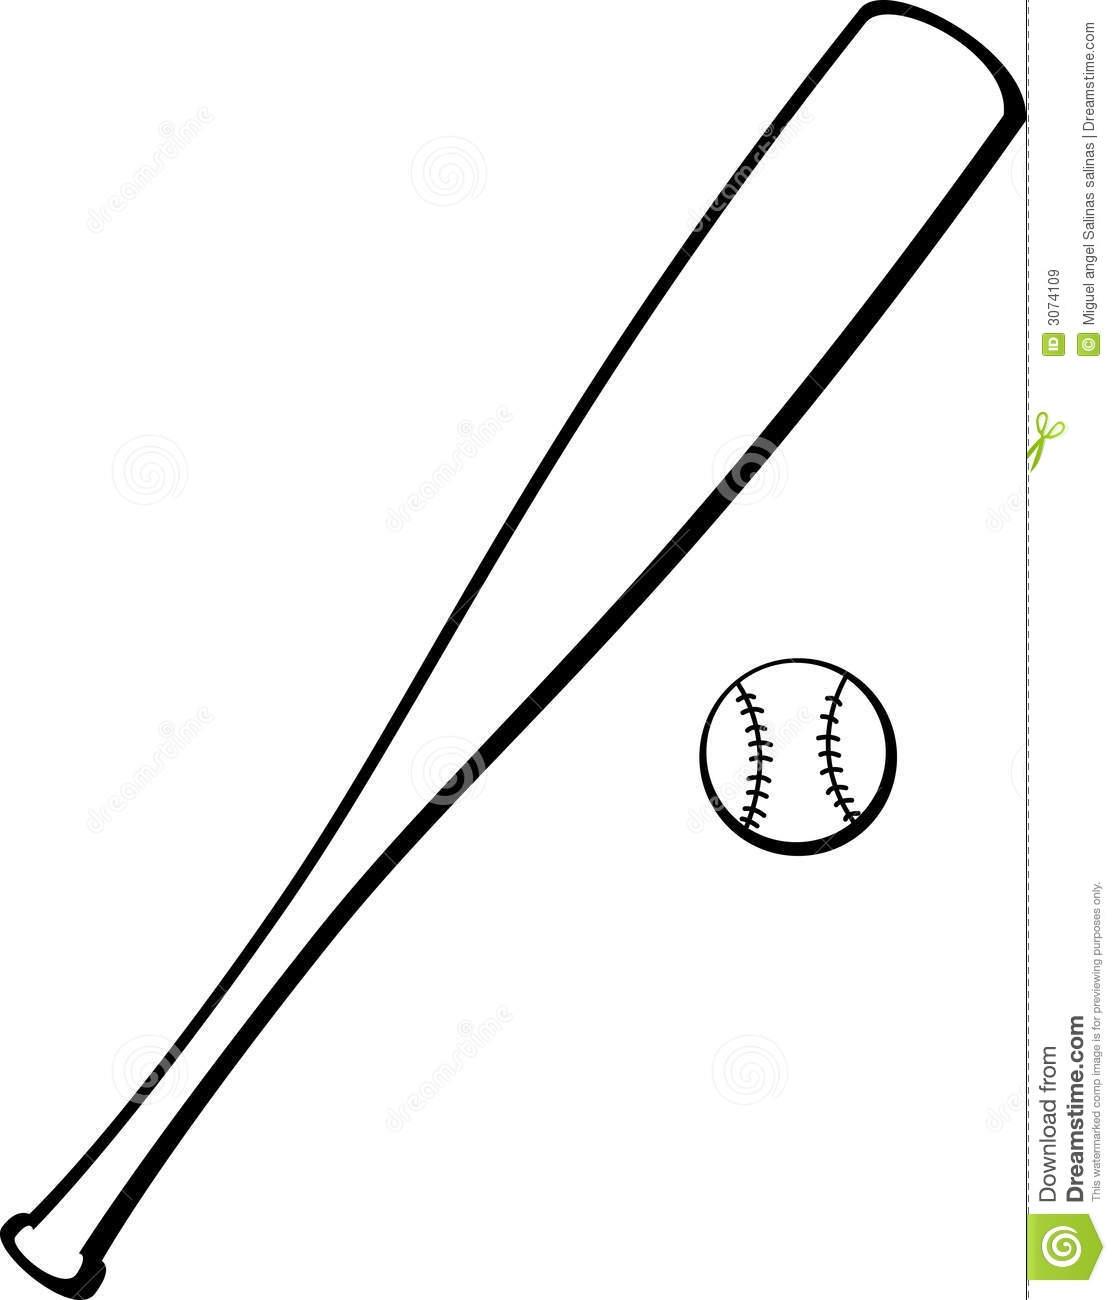 Bat And Ball Clipart